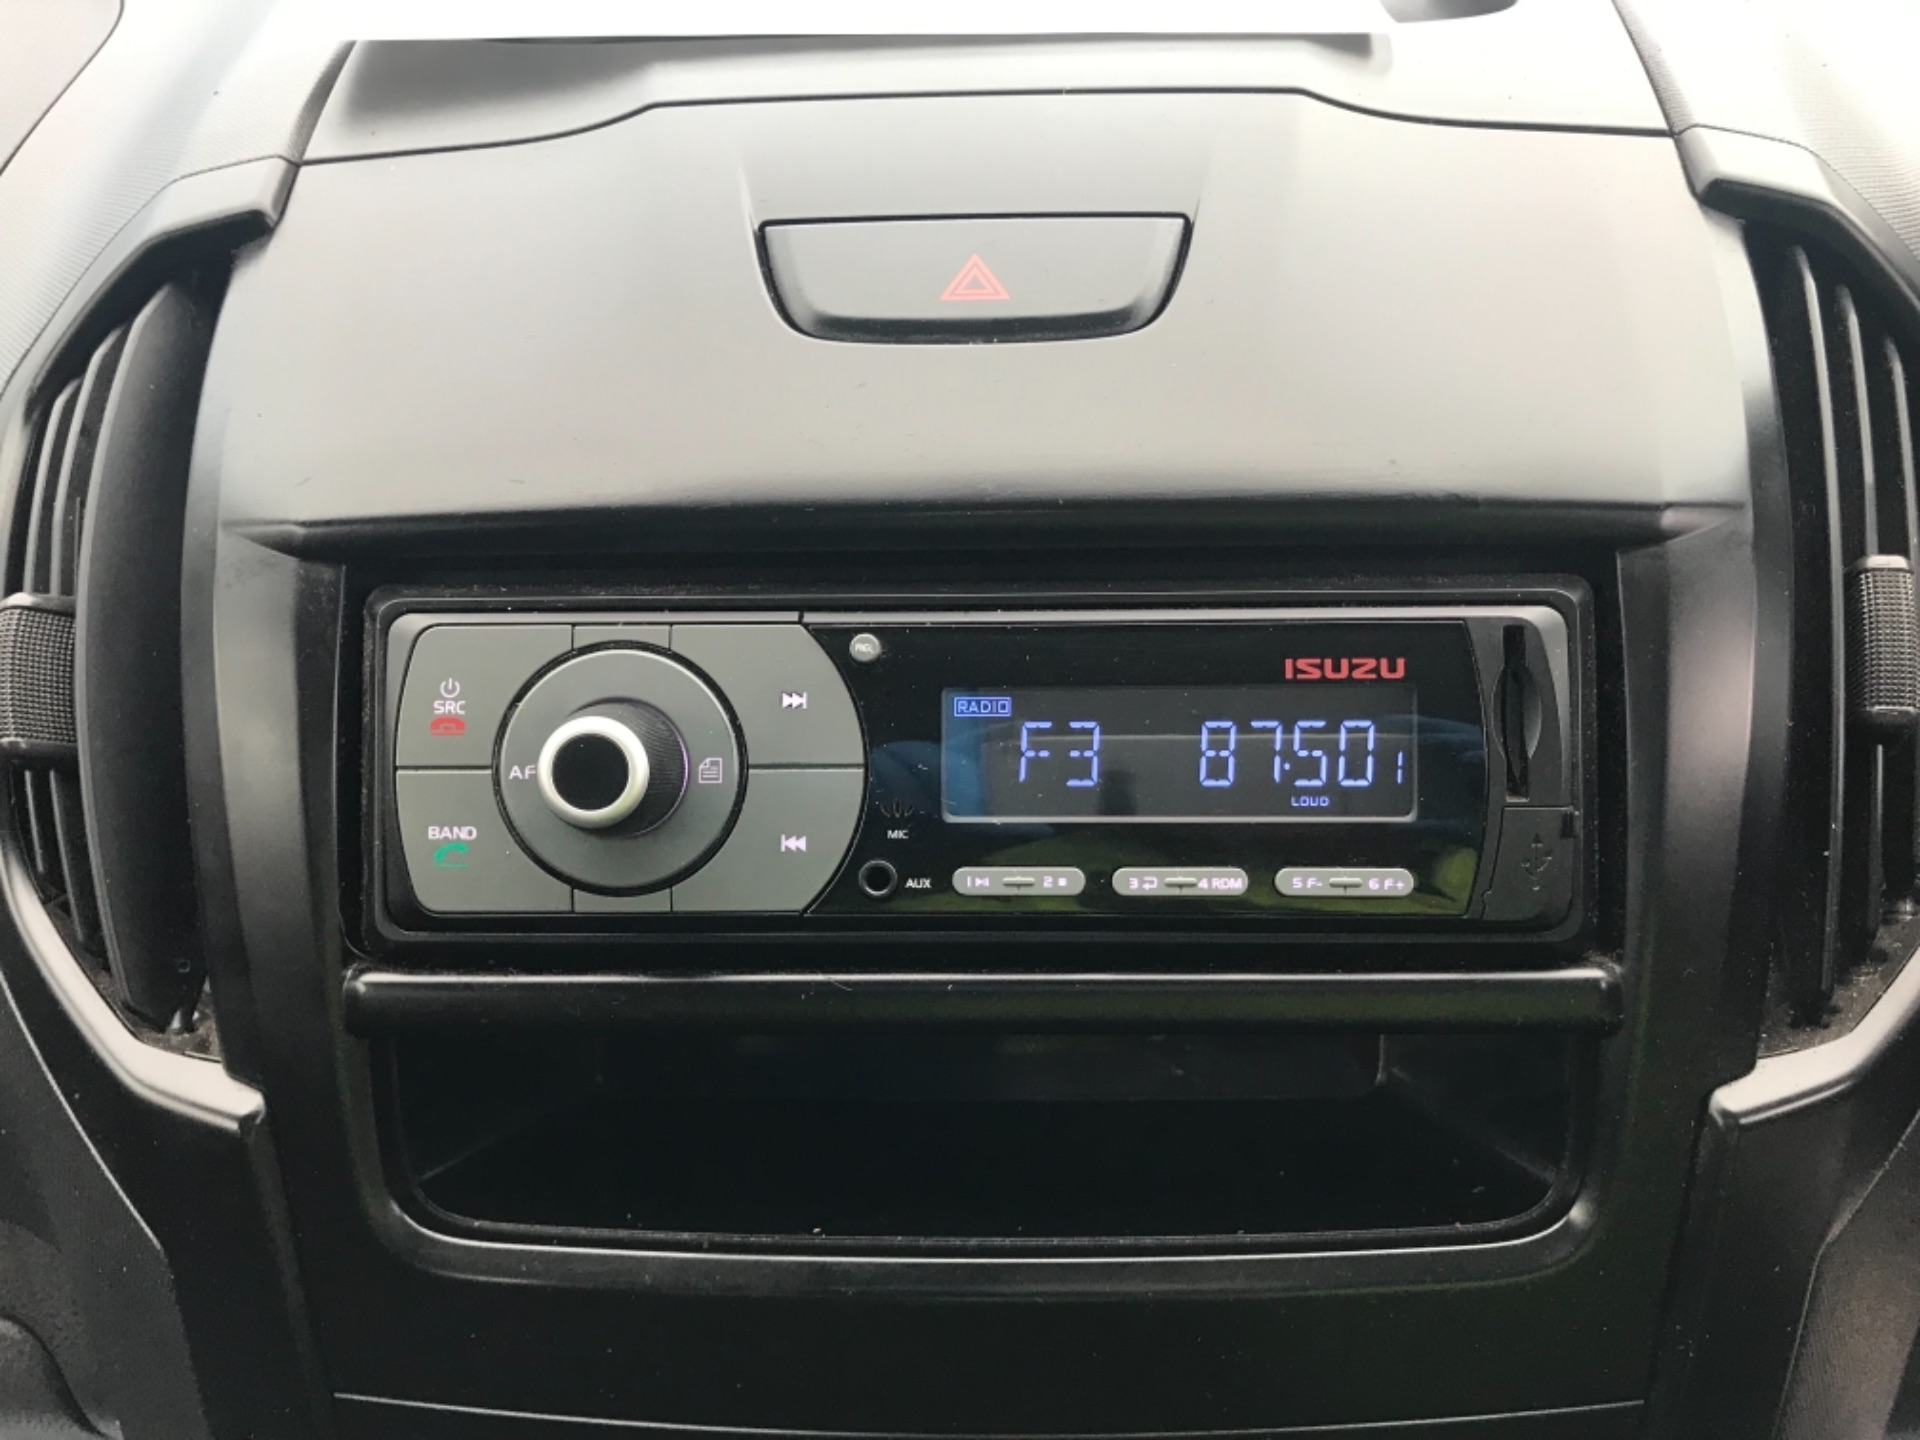 2018 Isuzu D-Max 1.9 Double Cab 4X4 (YG18FZJ) Image 13